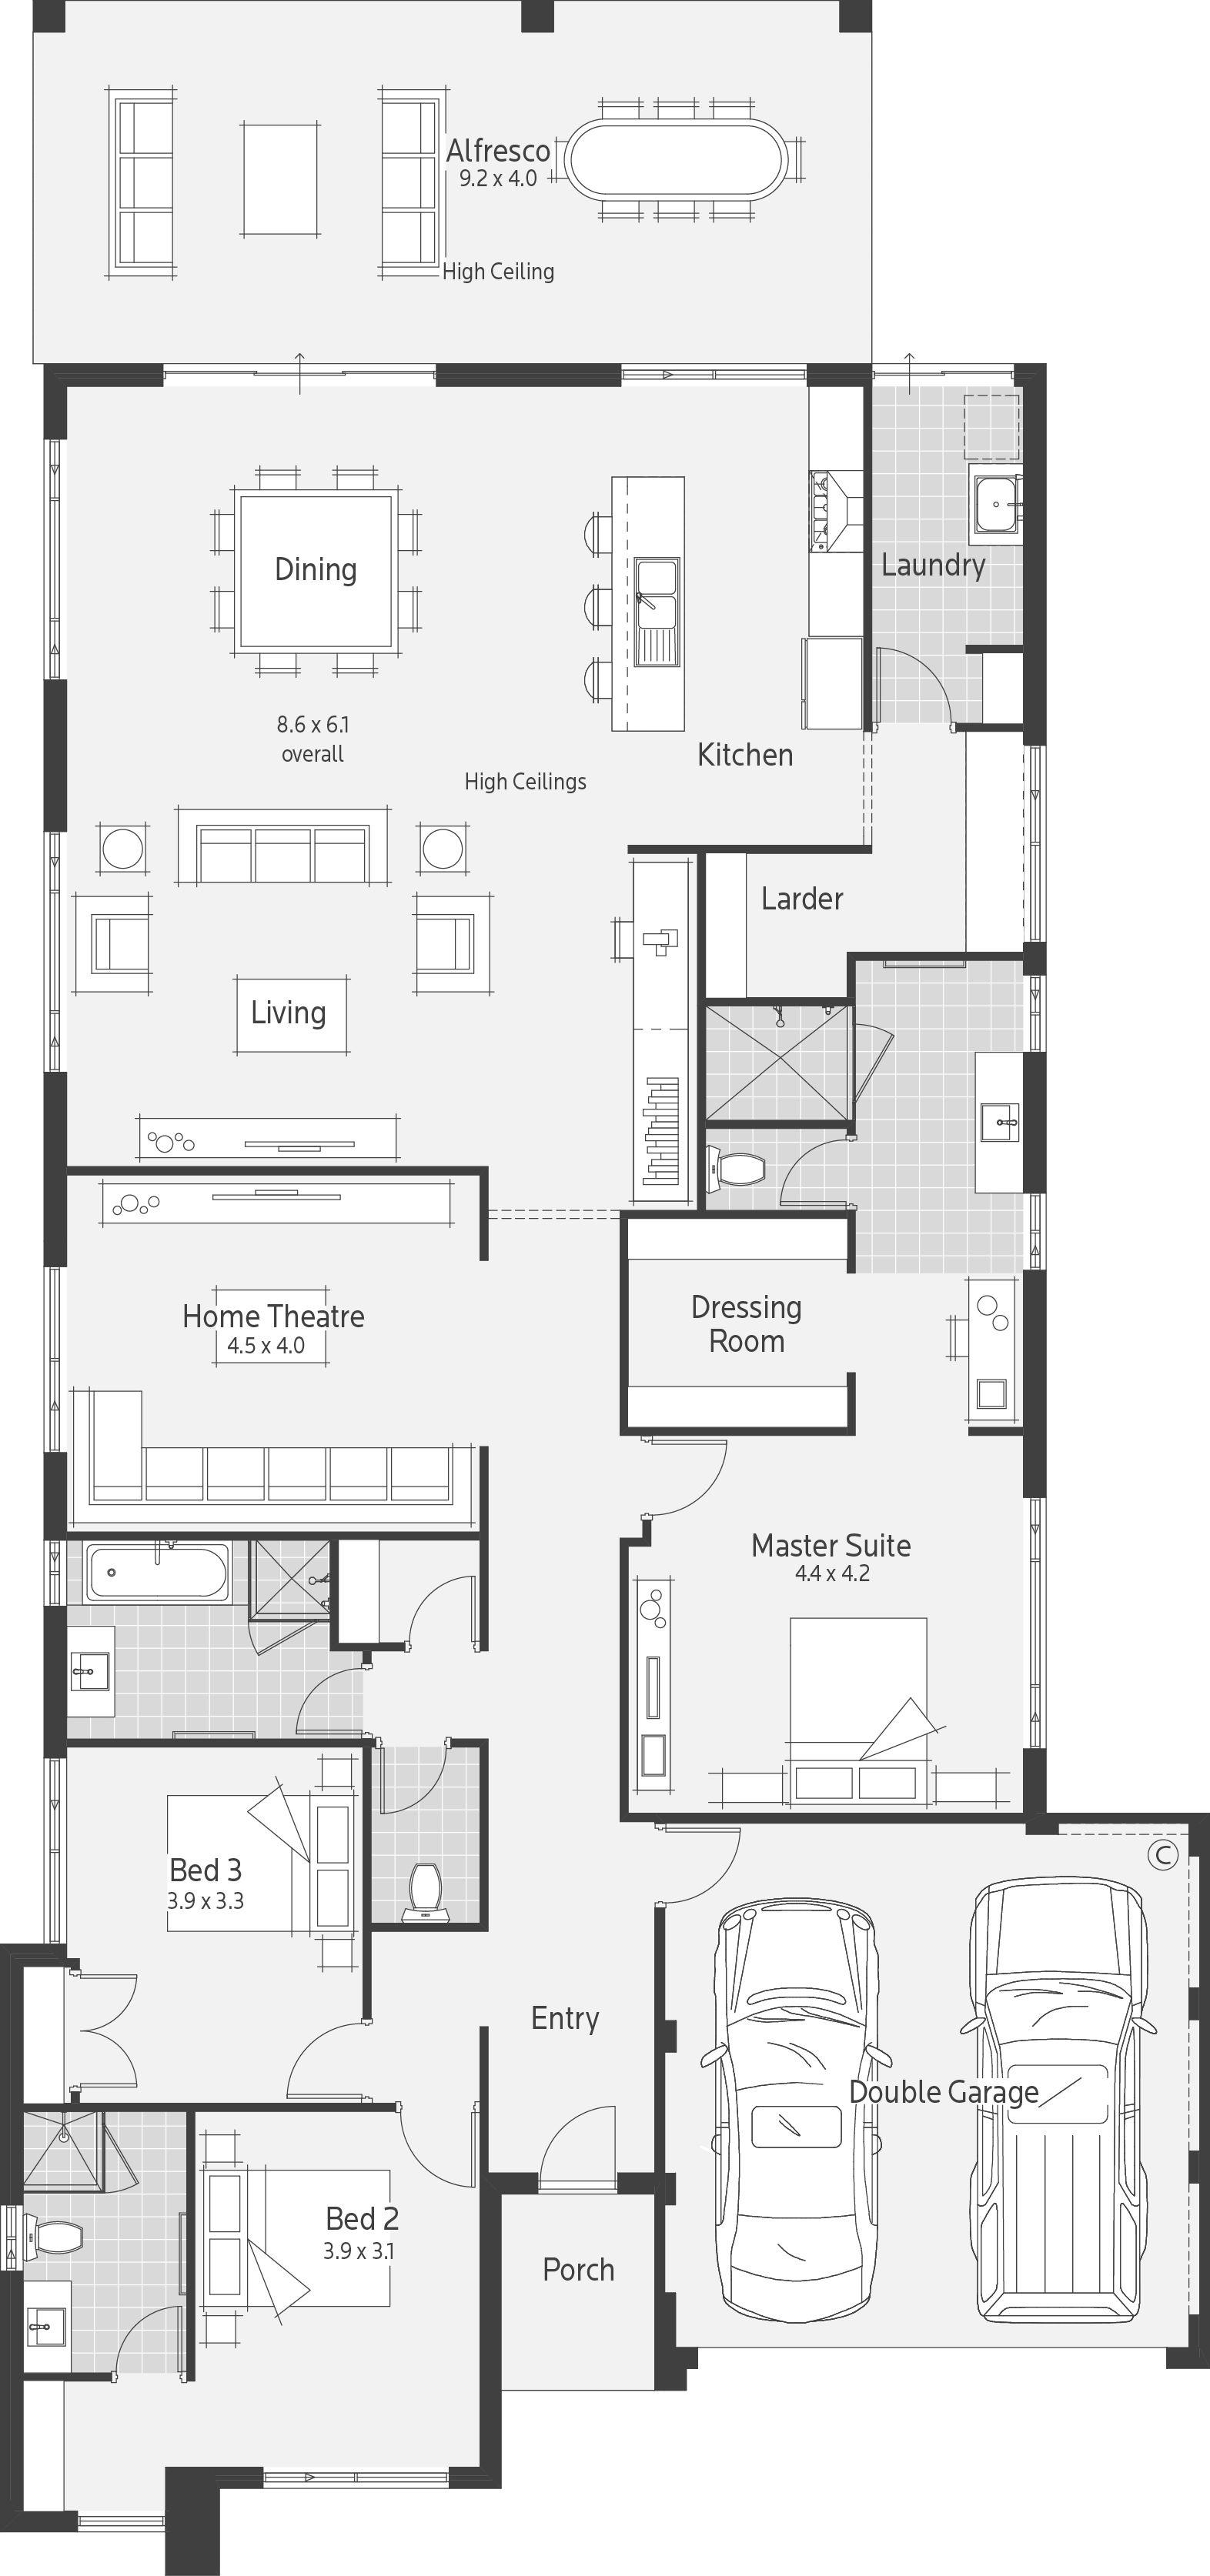 Pin By Kofi Otoo On House Plans Home Design Floor Plans New House Plans Dream House Plans